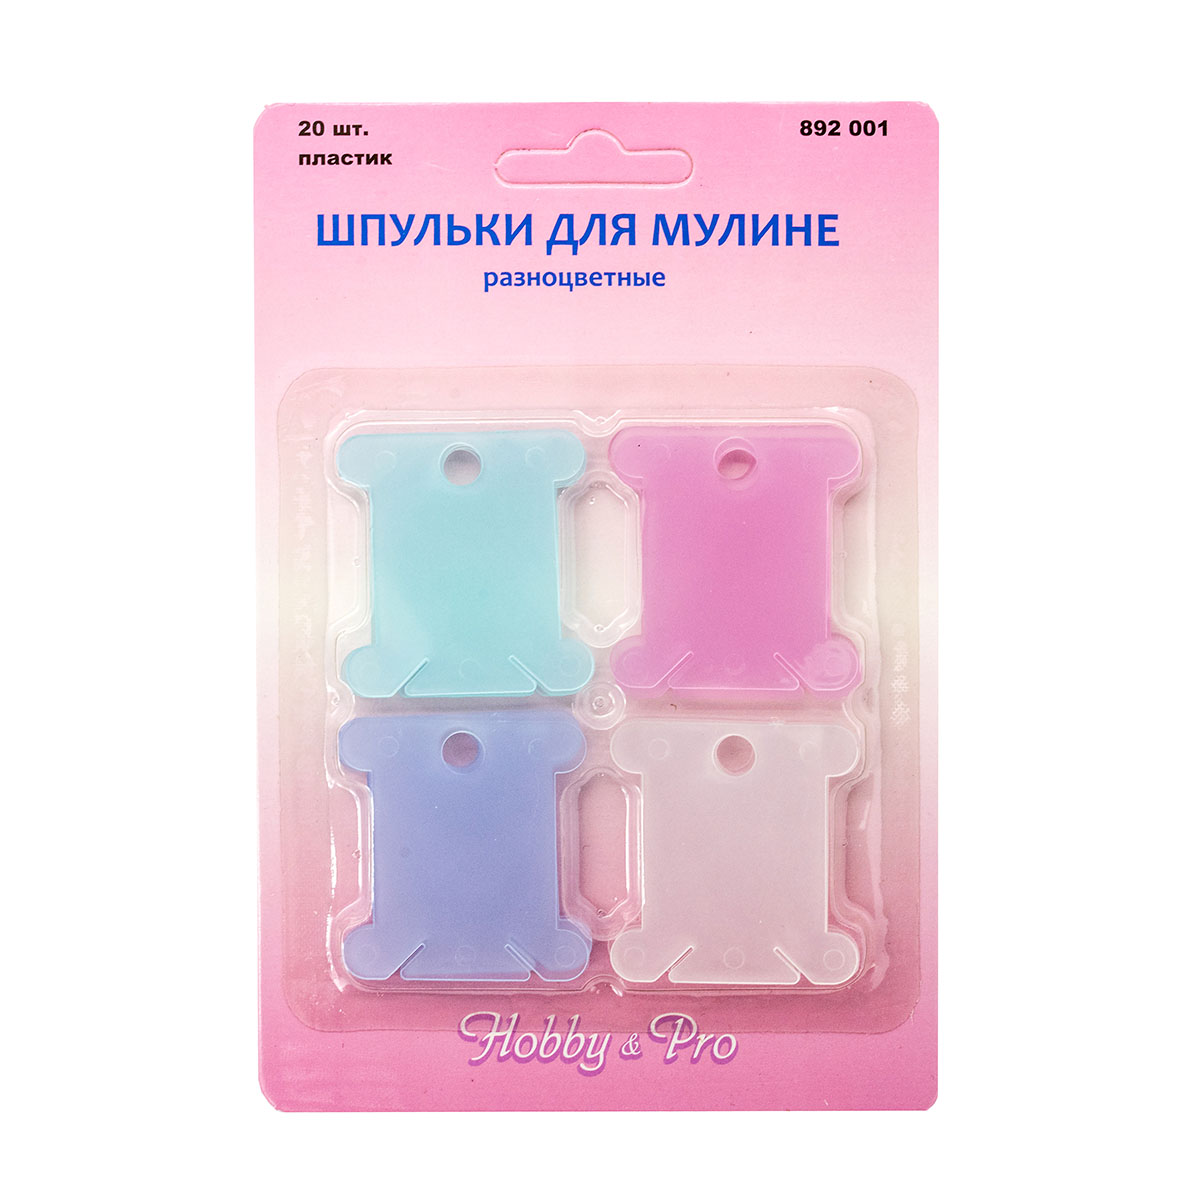 892001 Шпульки для наматывания мулине разноцветные, пластик, упак./20 шт., Hobby&Pro